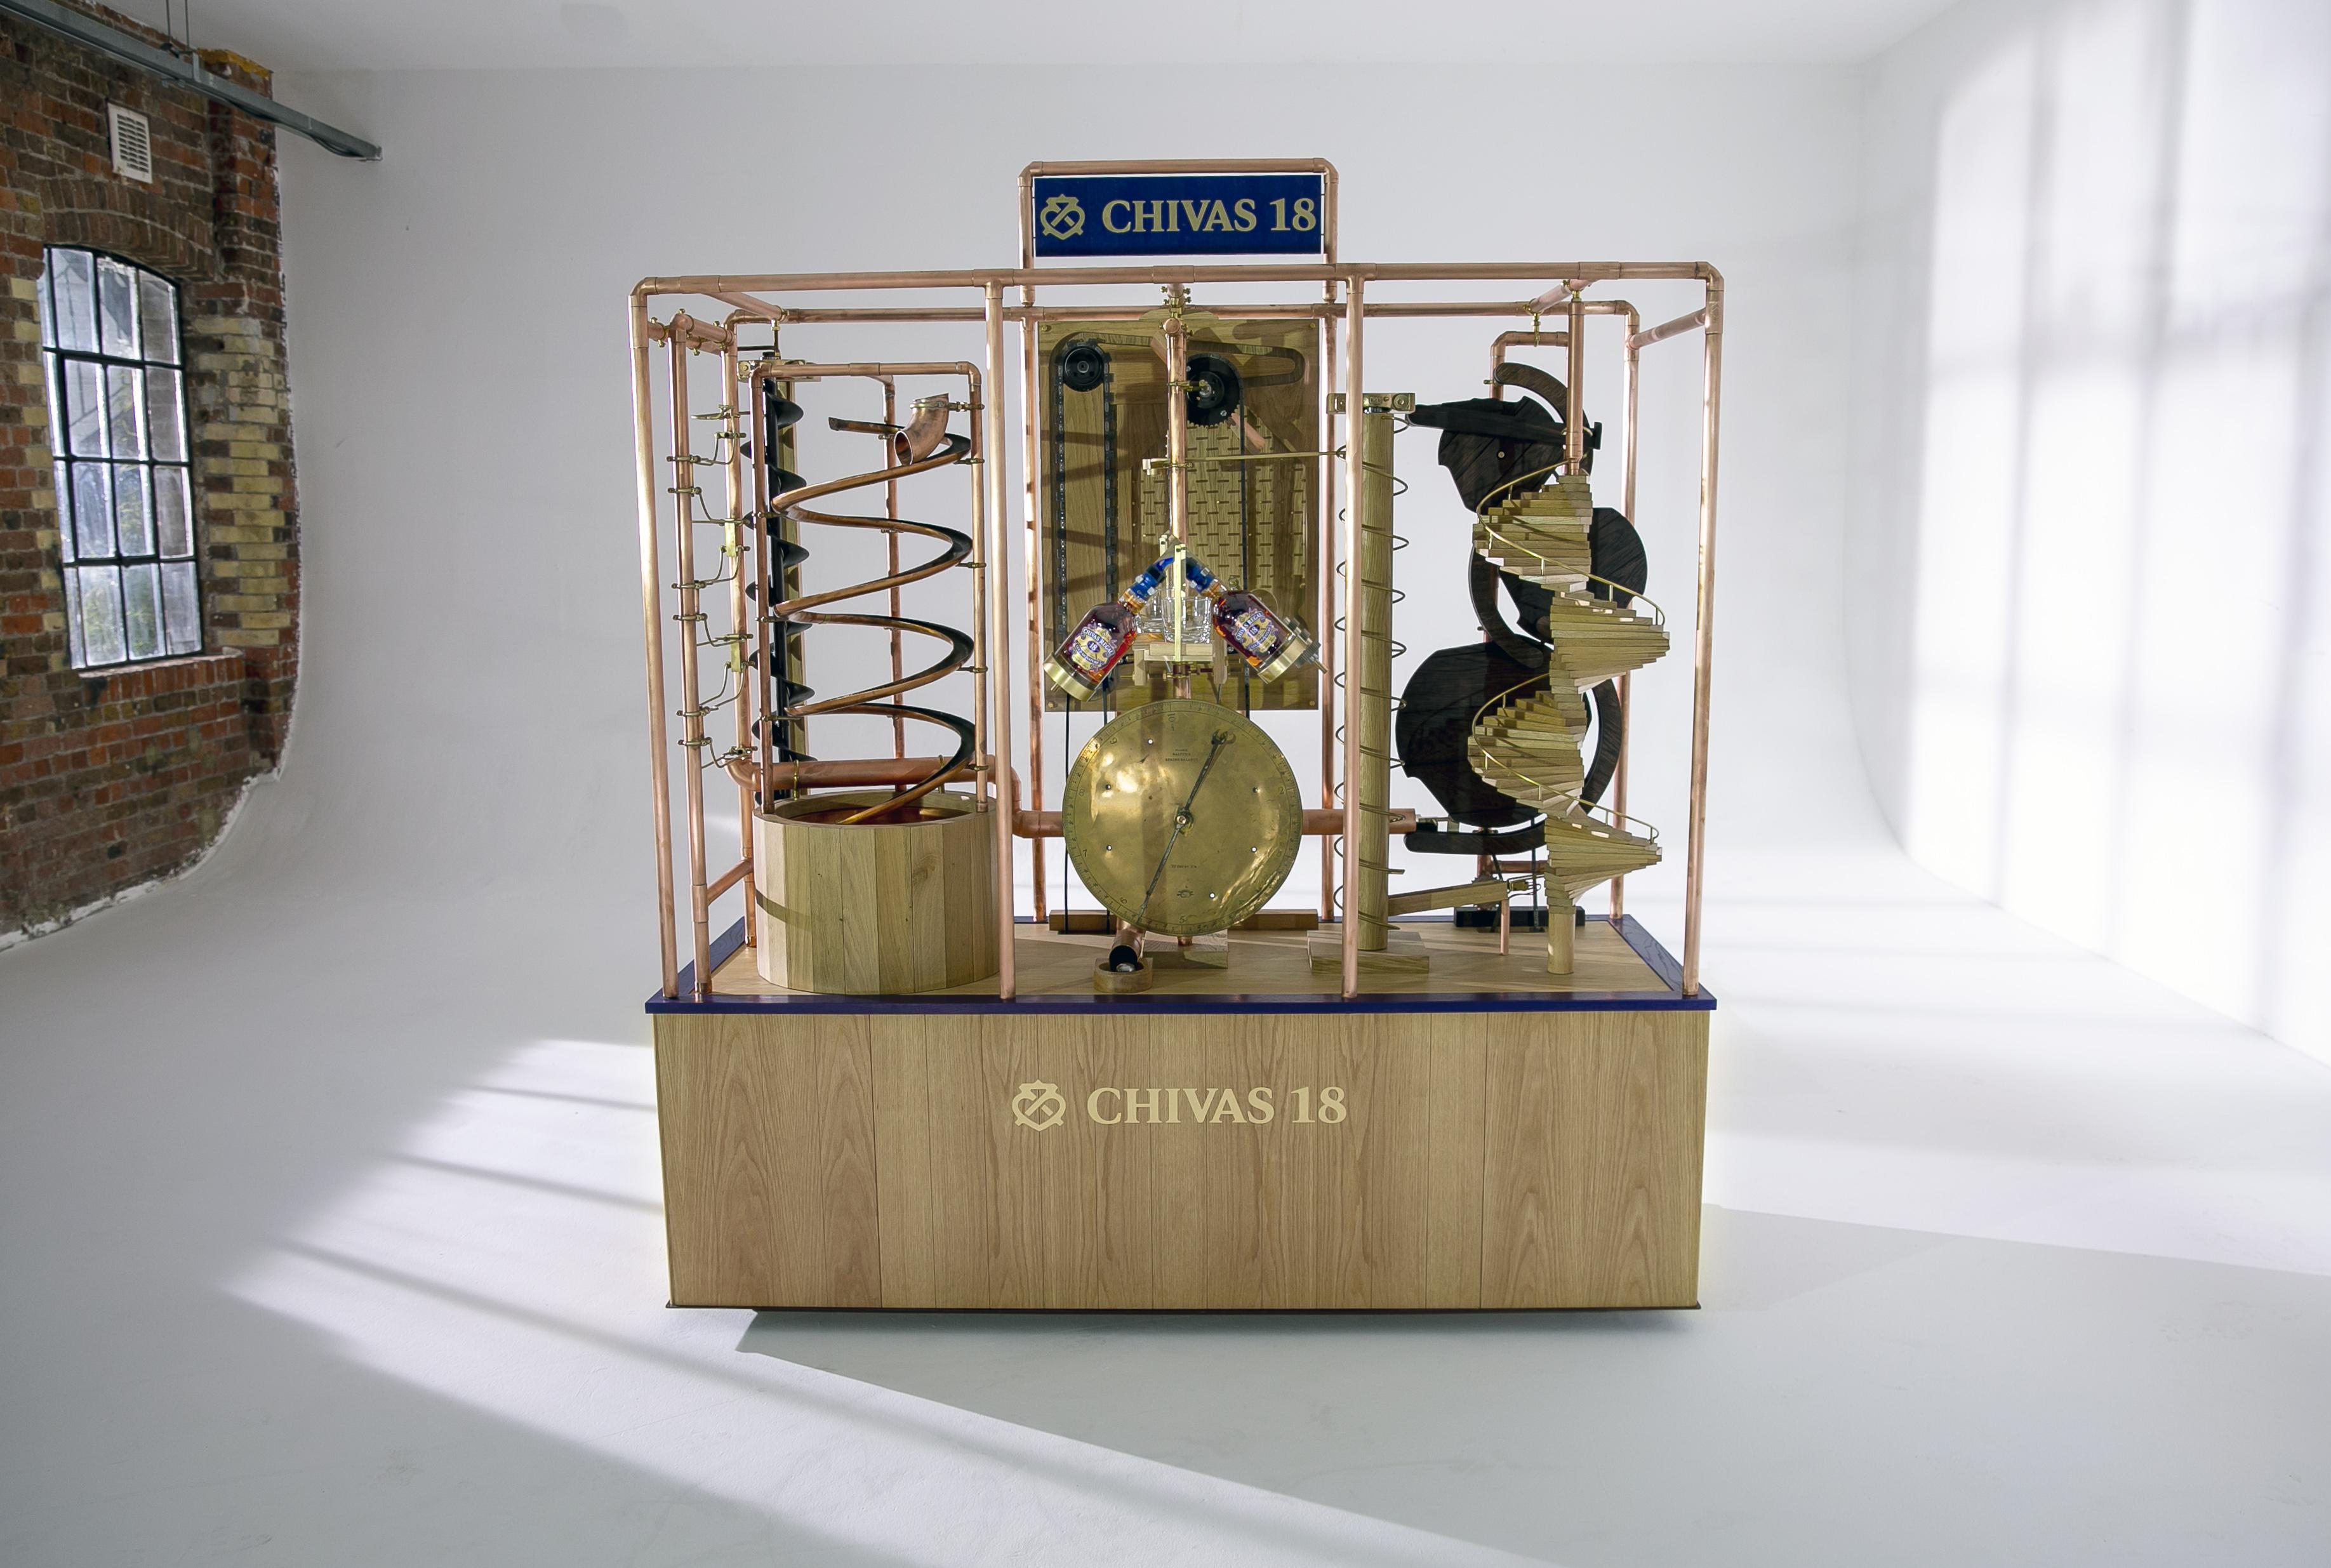 The Rube Goldberg-inspired whisky pouring machine by Chivas